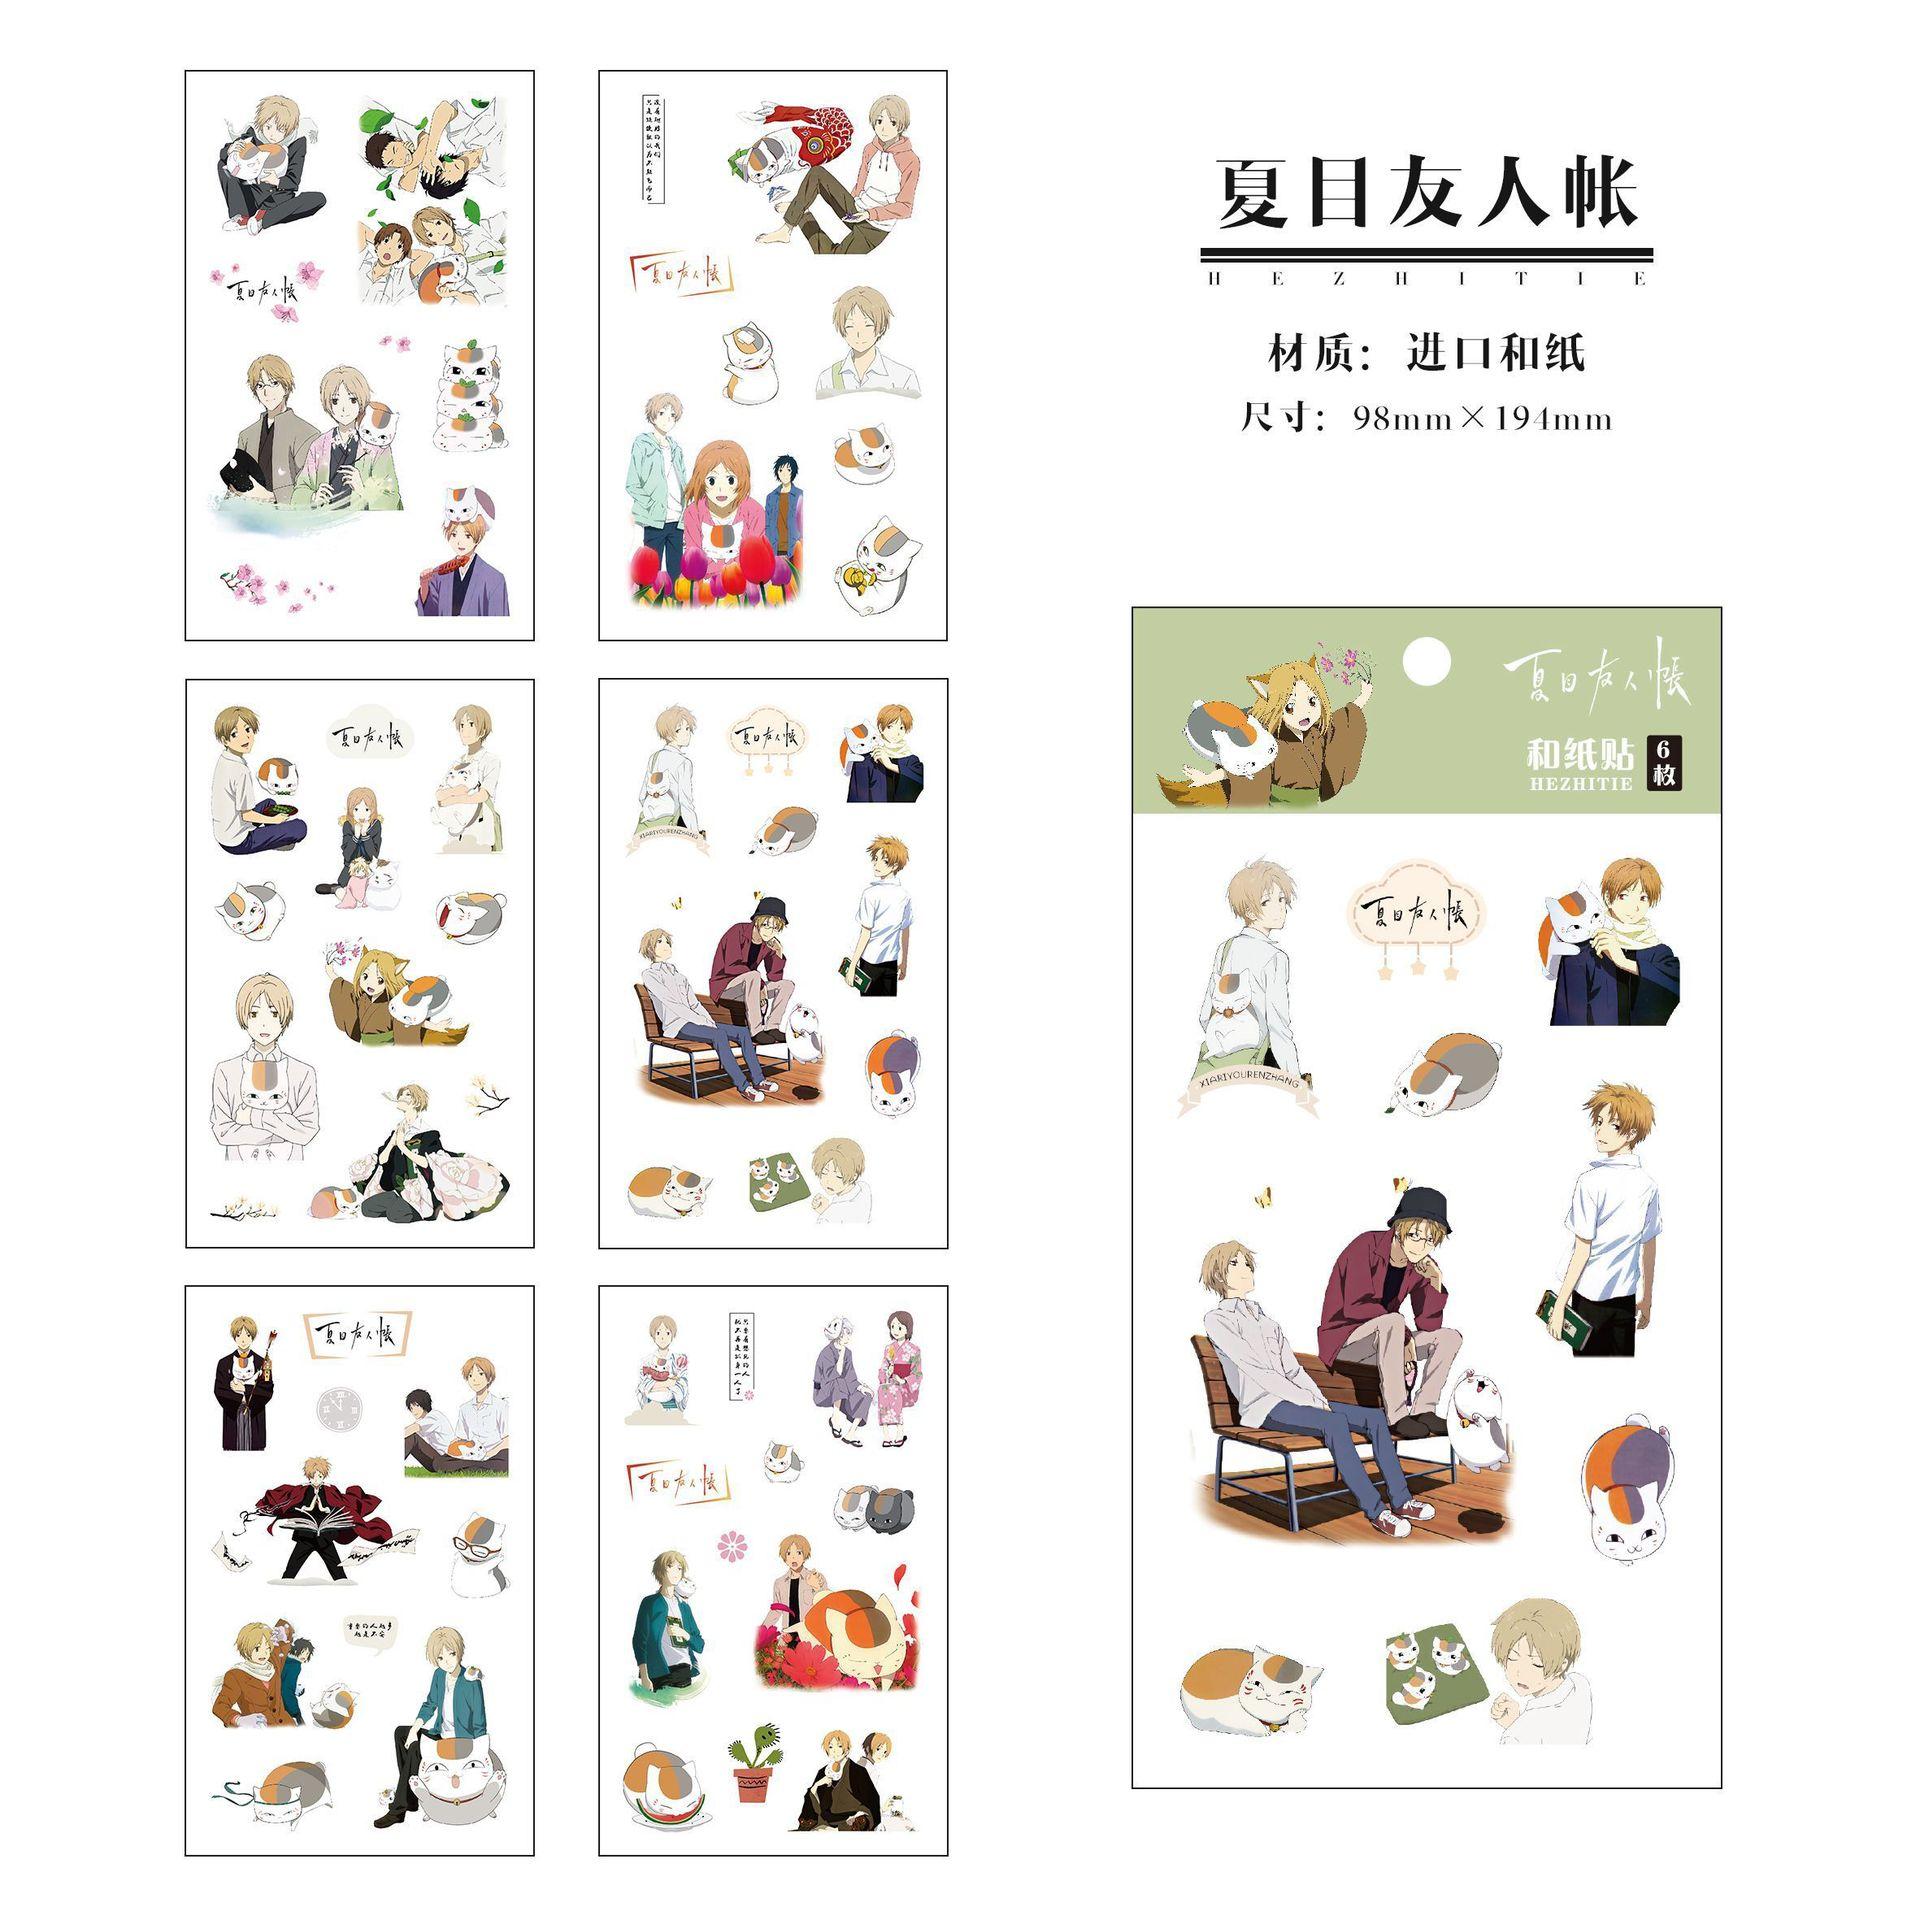 6 Sheets/Set  Anime Natsume Yuujinchou Decorative Sticker DIY Diary Scrapbooking Label Stickers Gift Stationery